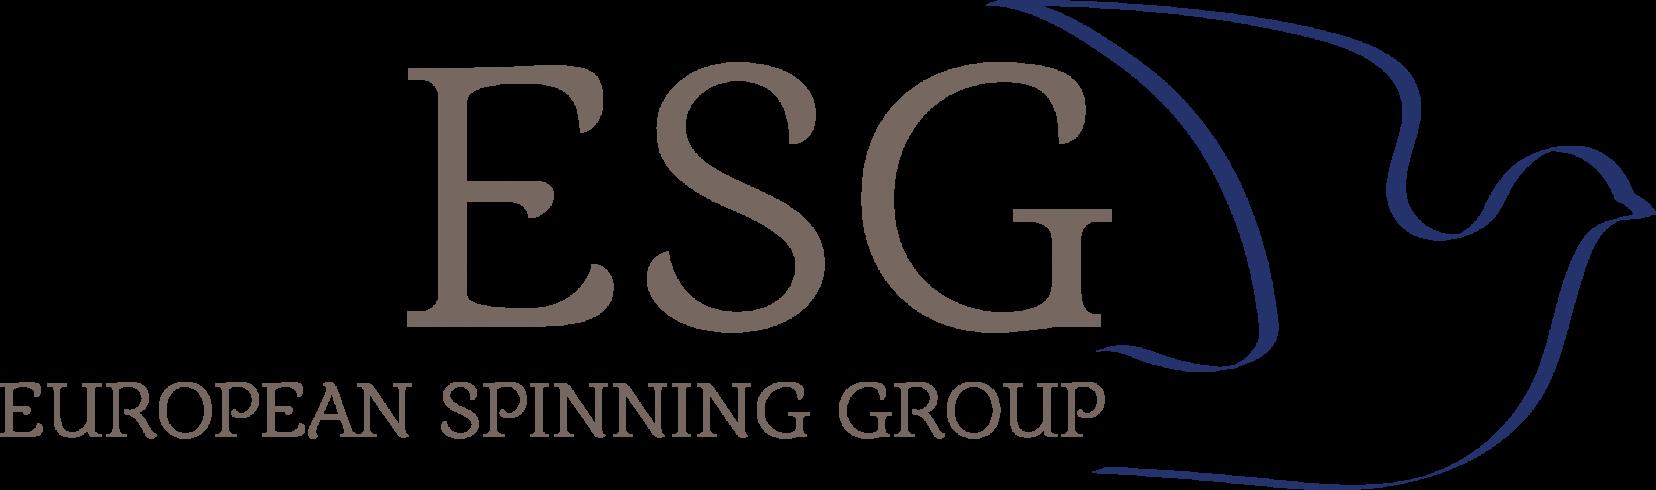 ESG.png